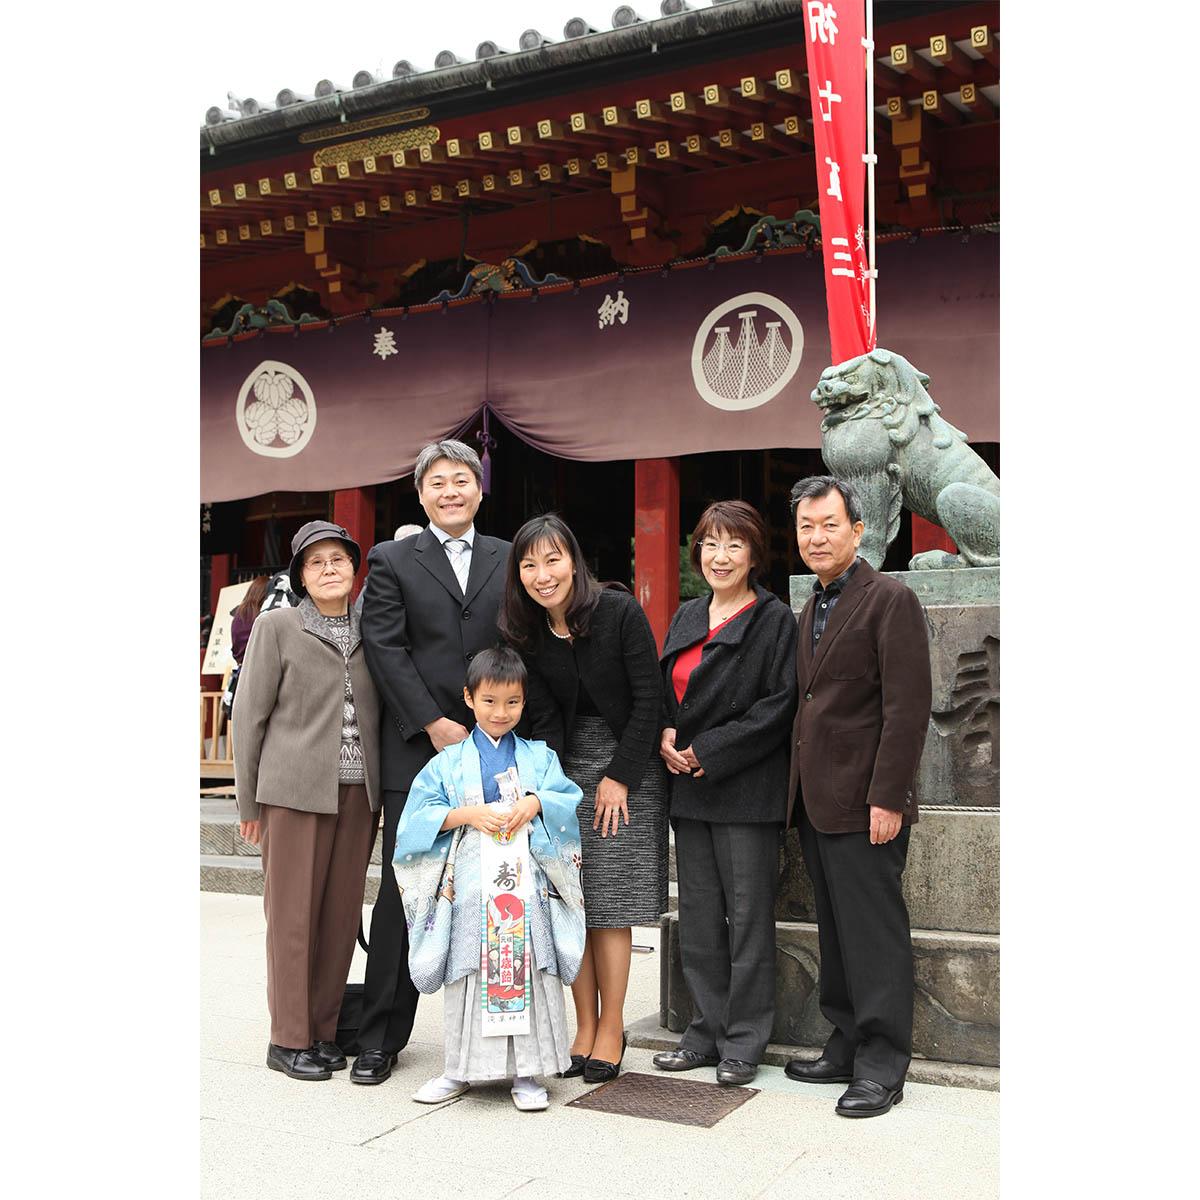 東京最古の神社 浅草神社の本殿前で記念撮影